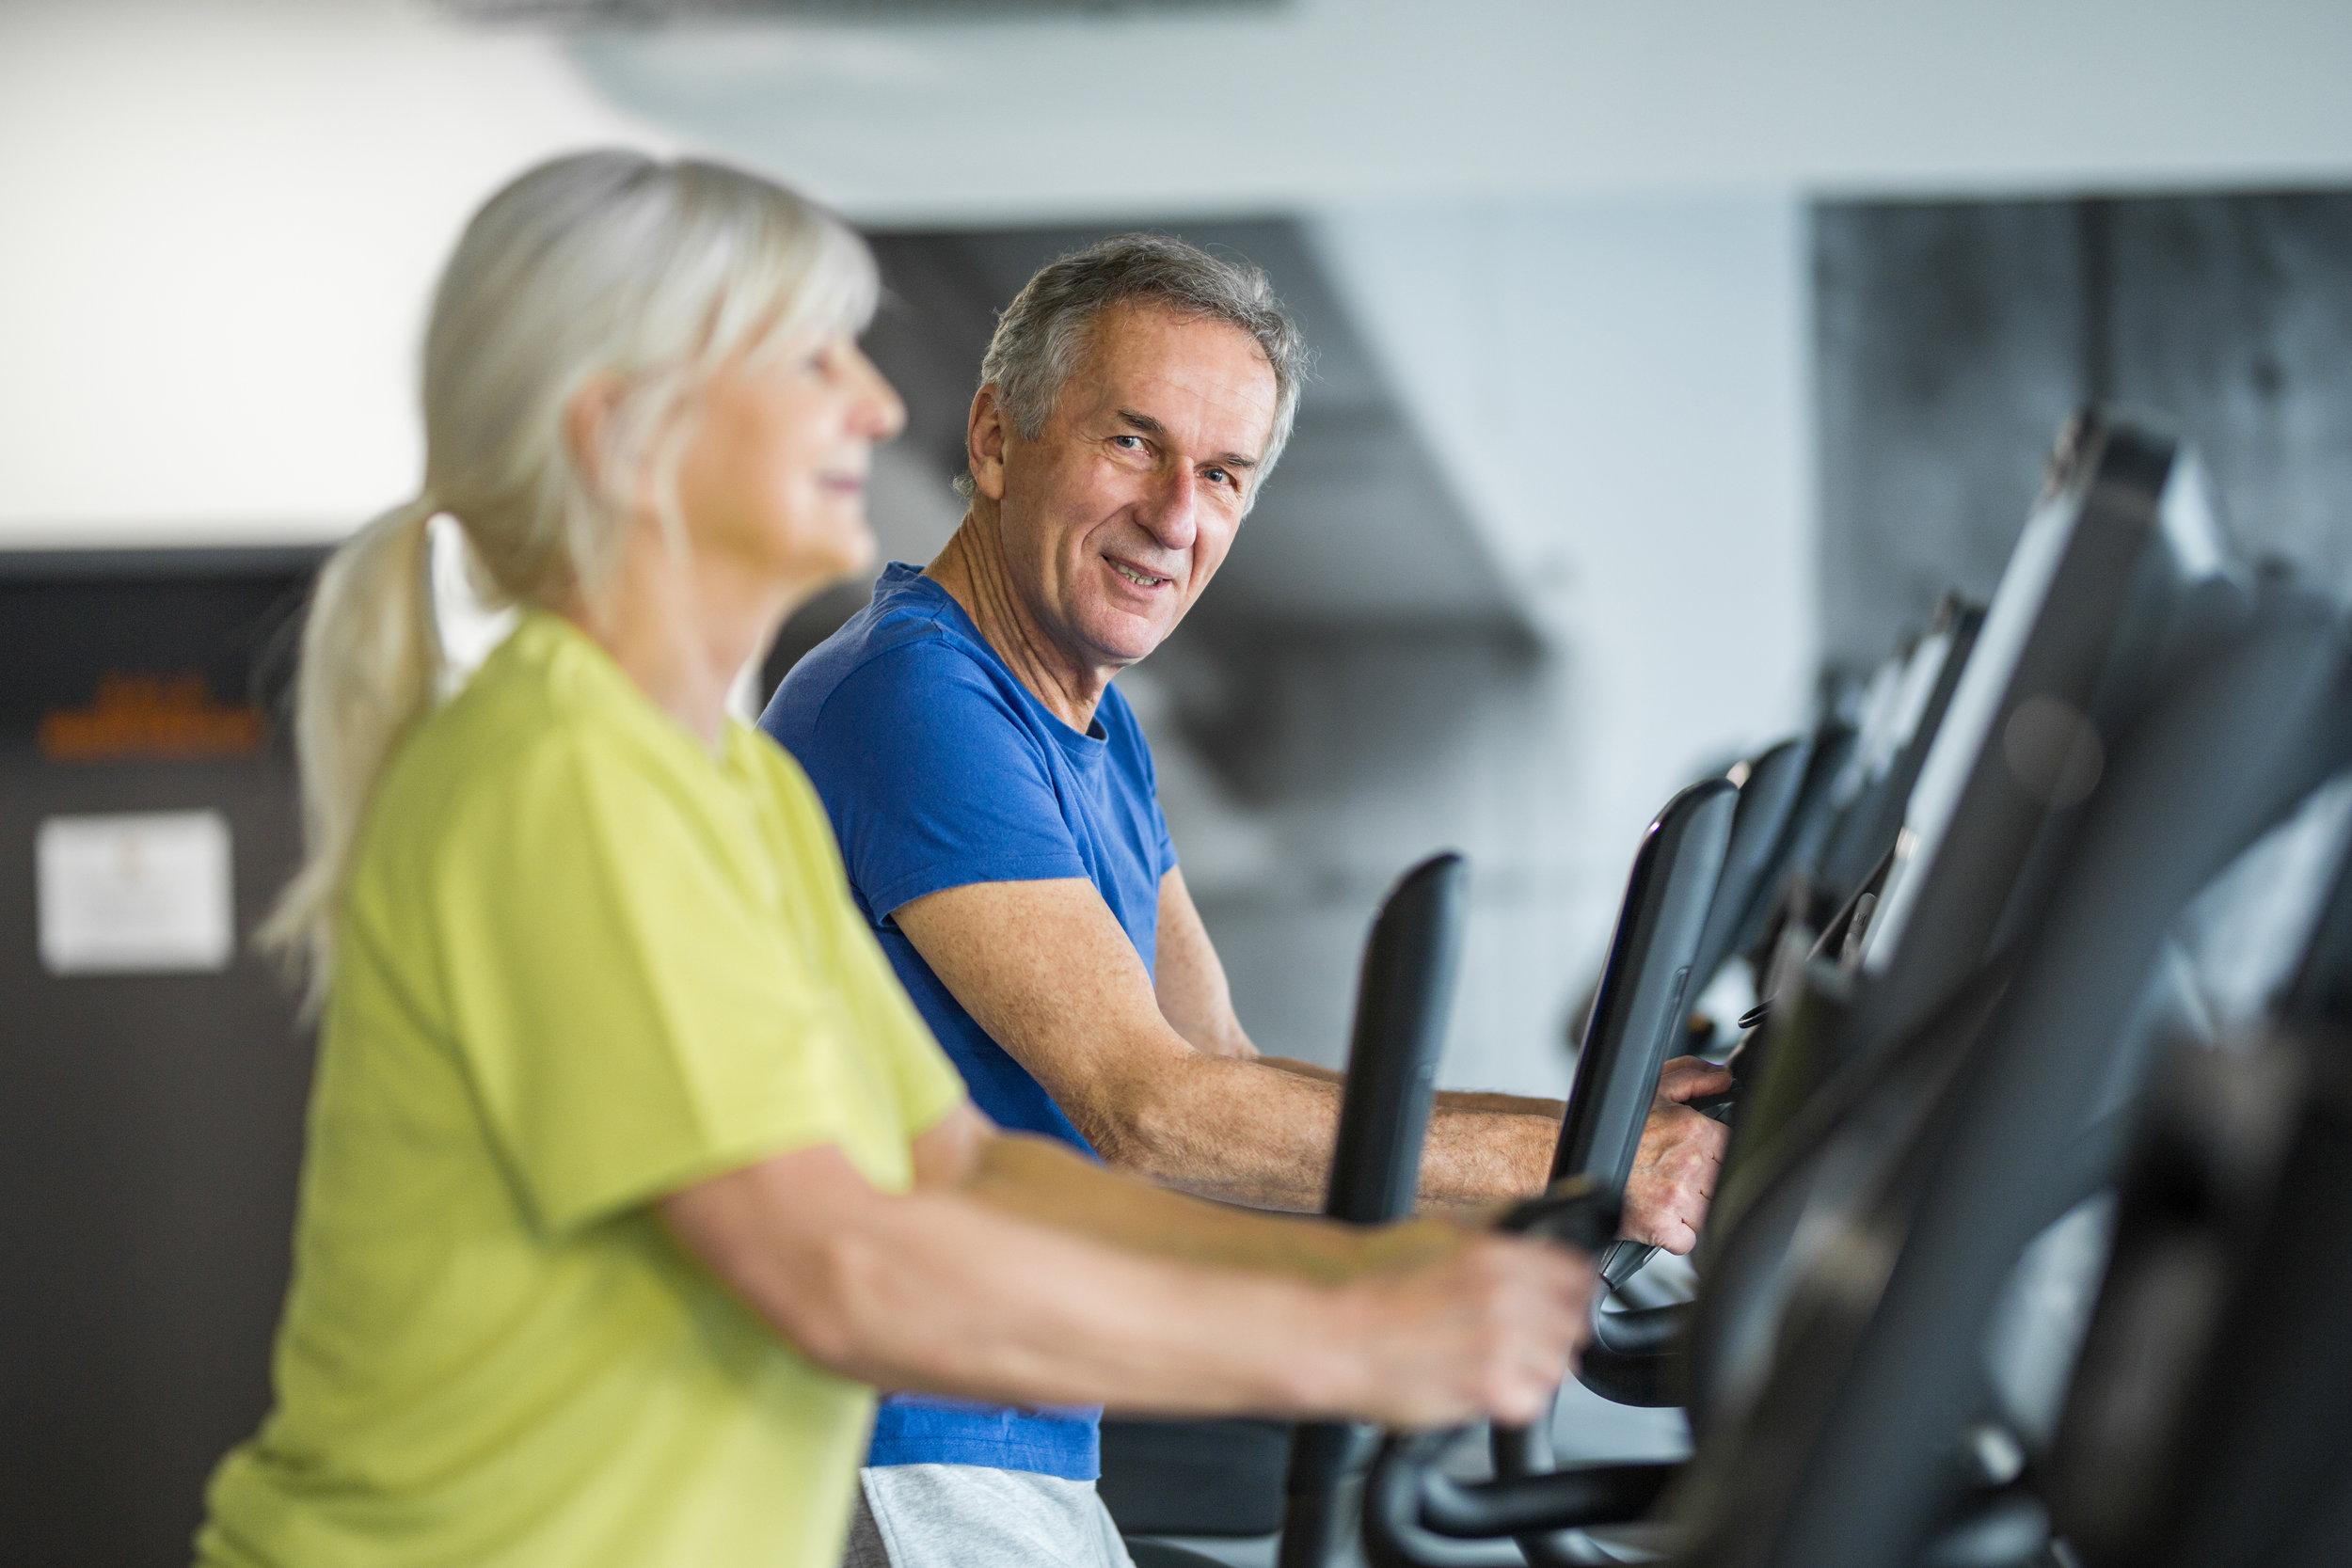 Healthy Lifestyle -